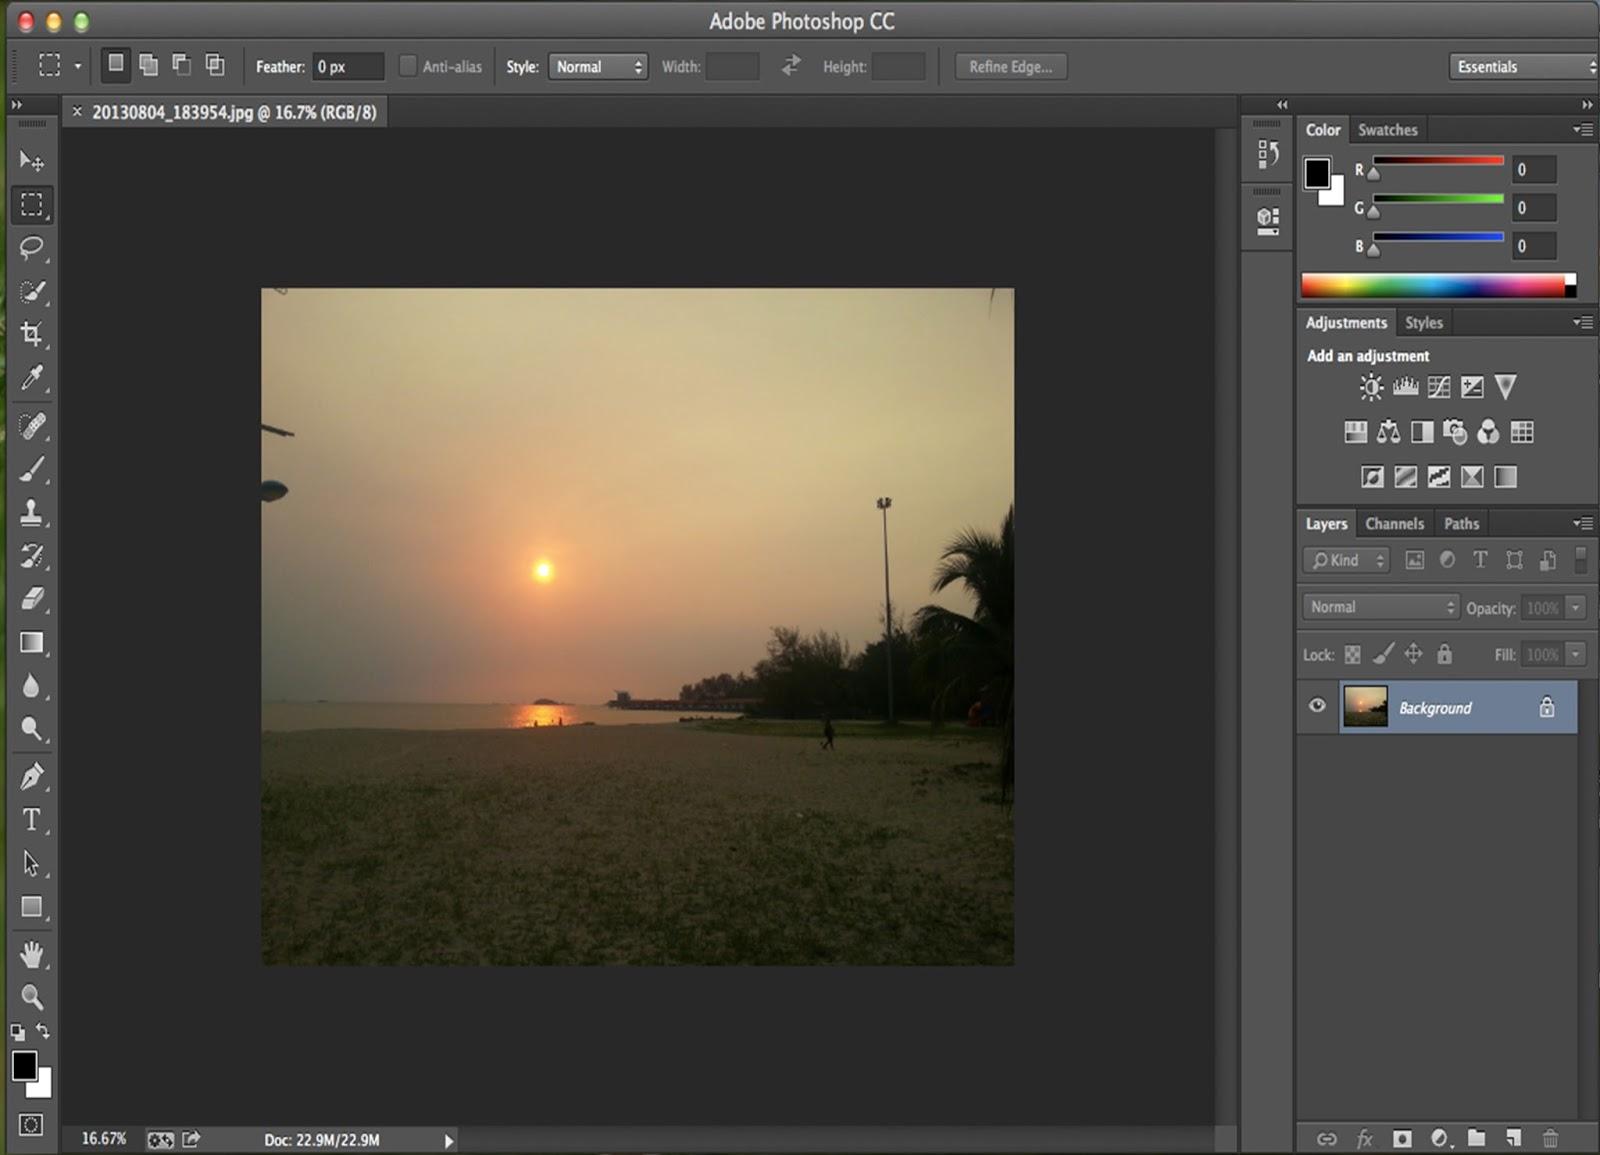 TRINKYAN: Adobe Photoshop CC 14 0